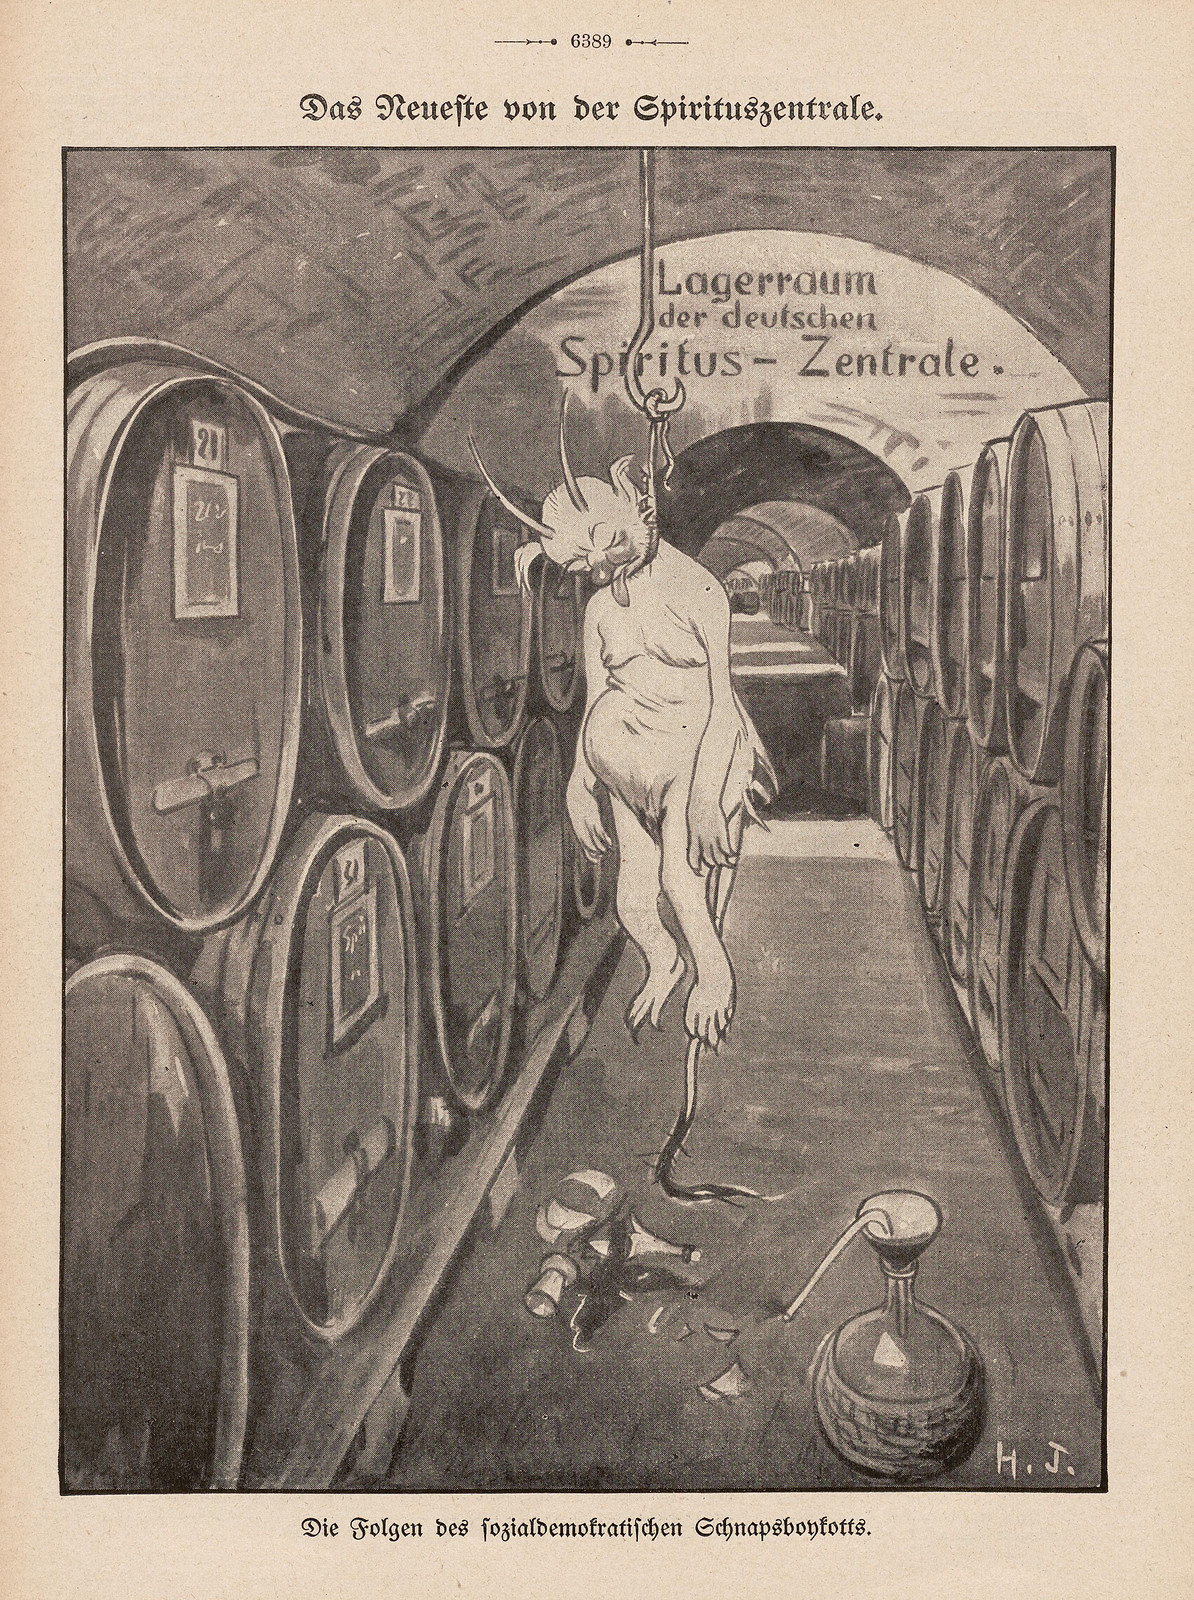 Hans Gabriel Jentzsch - The latest from the Spiritus headquarters, 1909